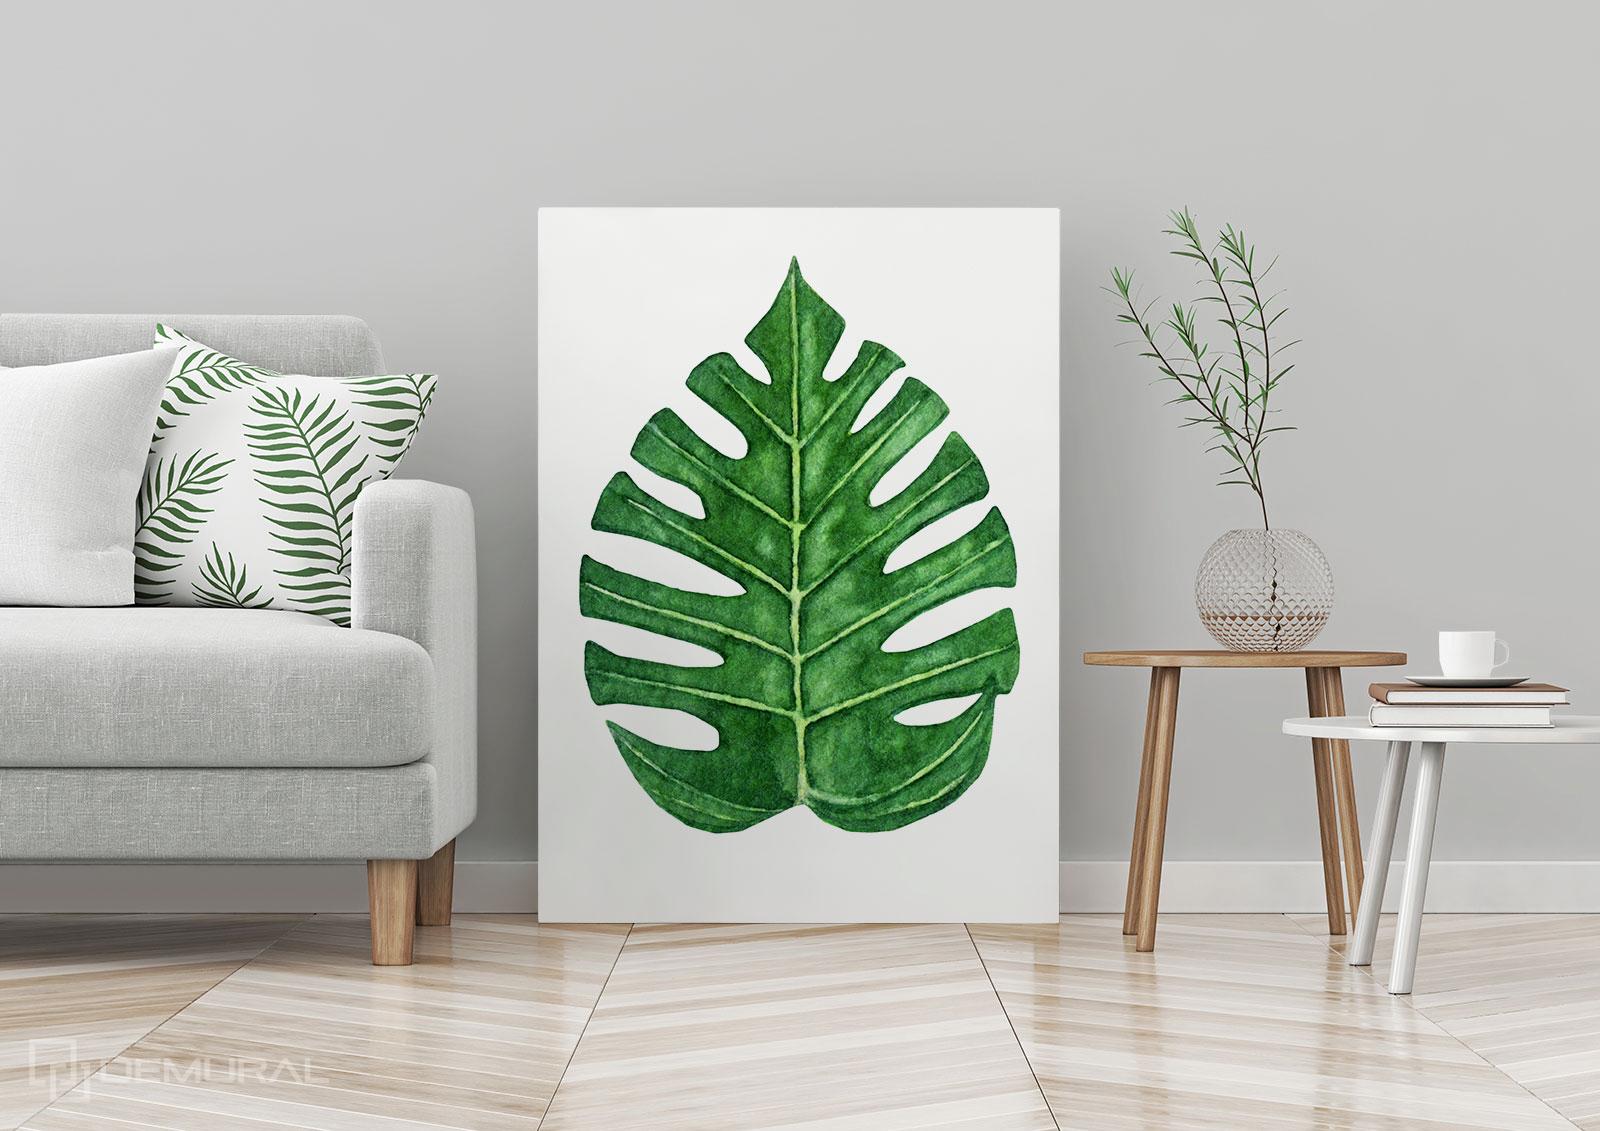 Bilder tropisches Blatt - tropischen Blätter -Demural